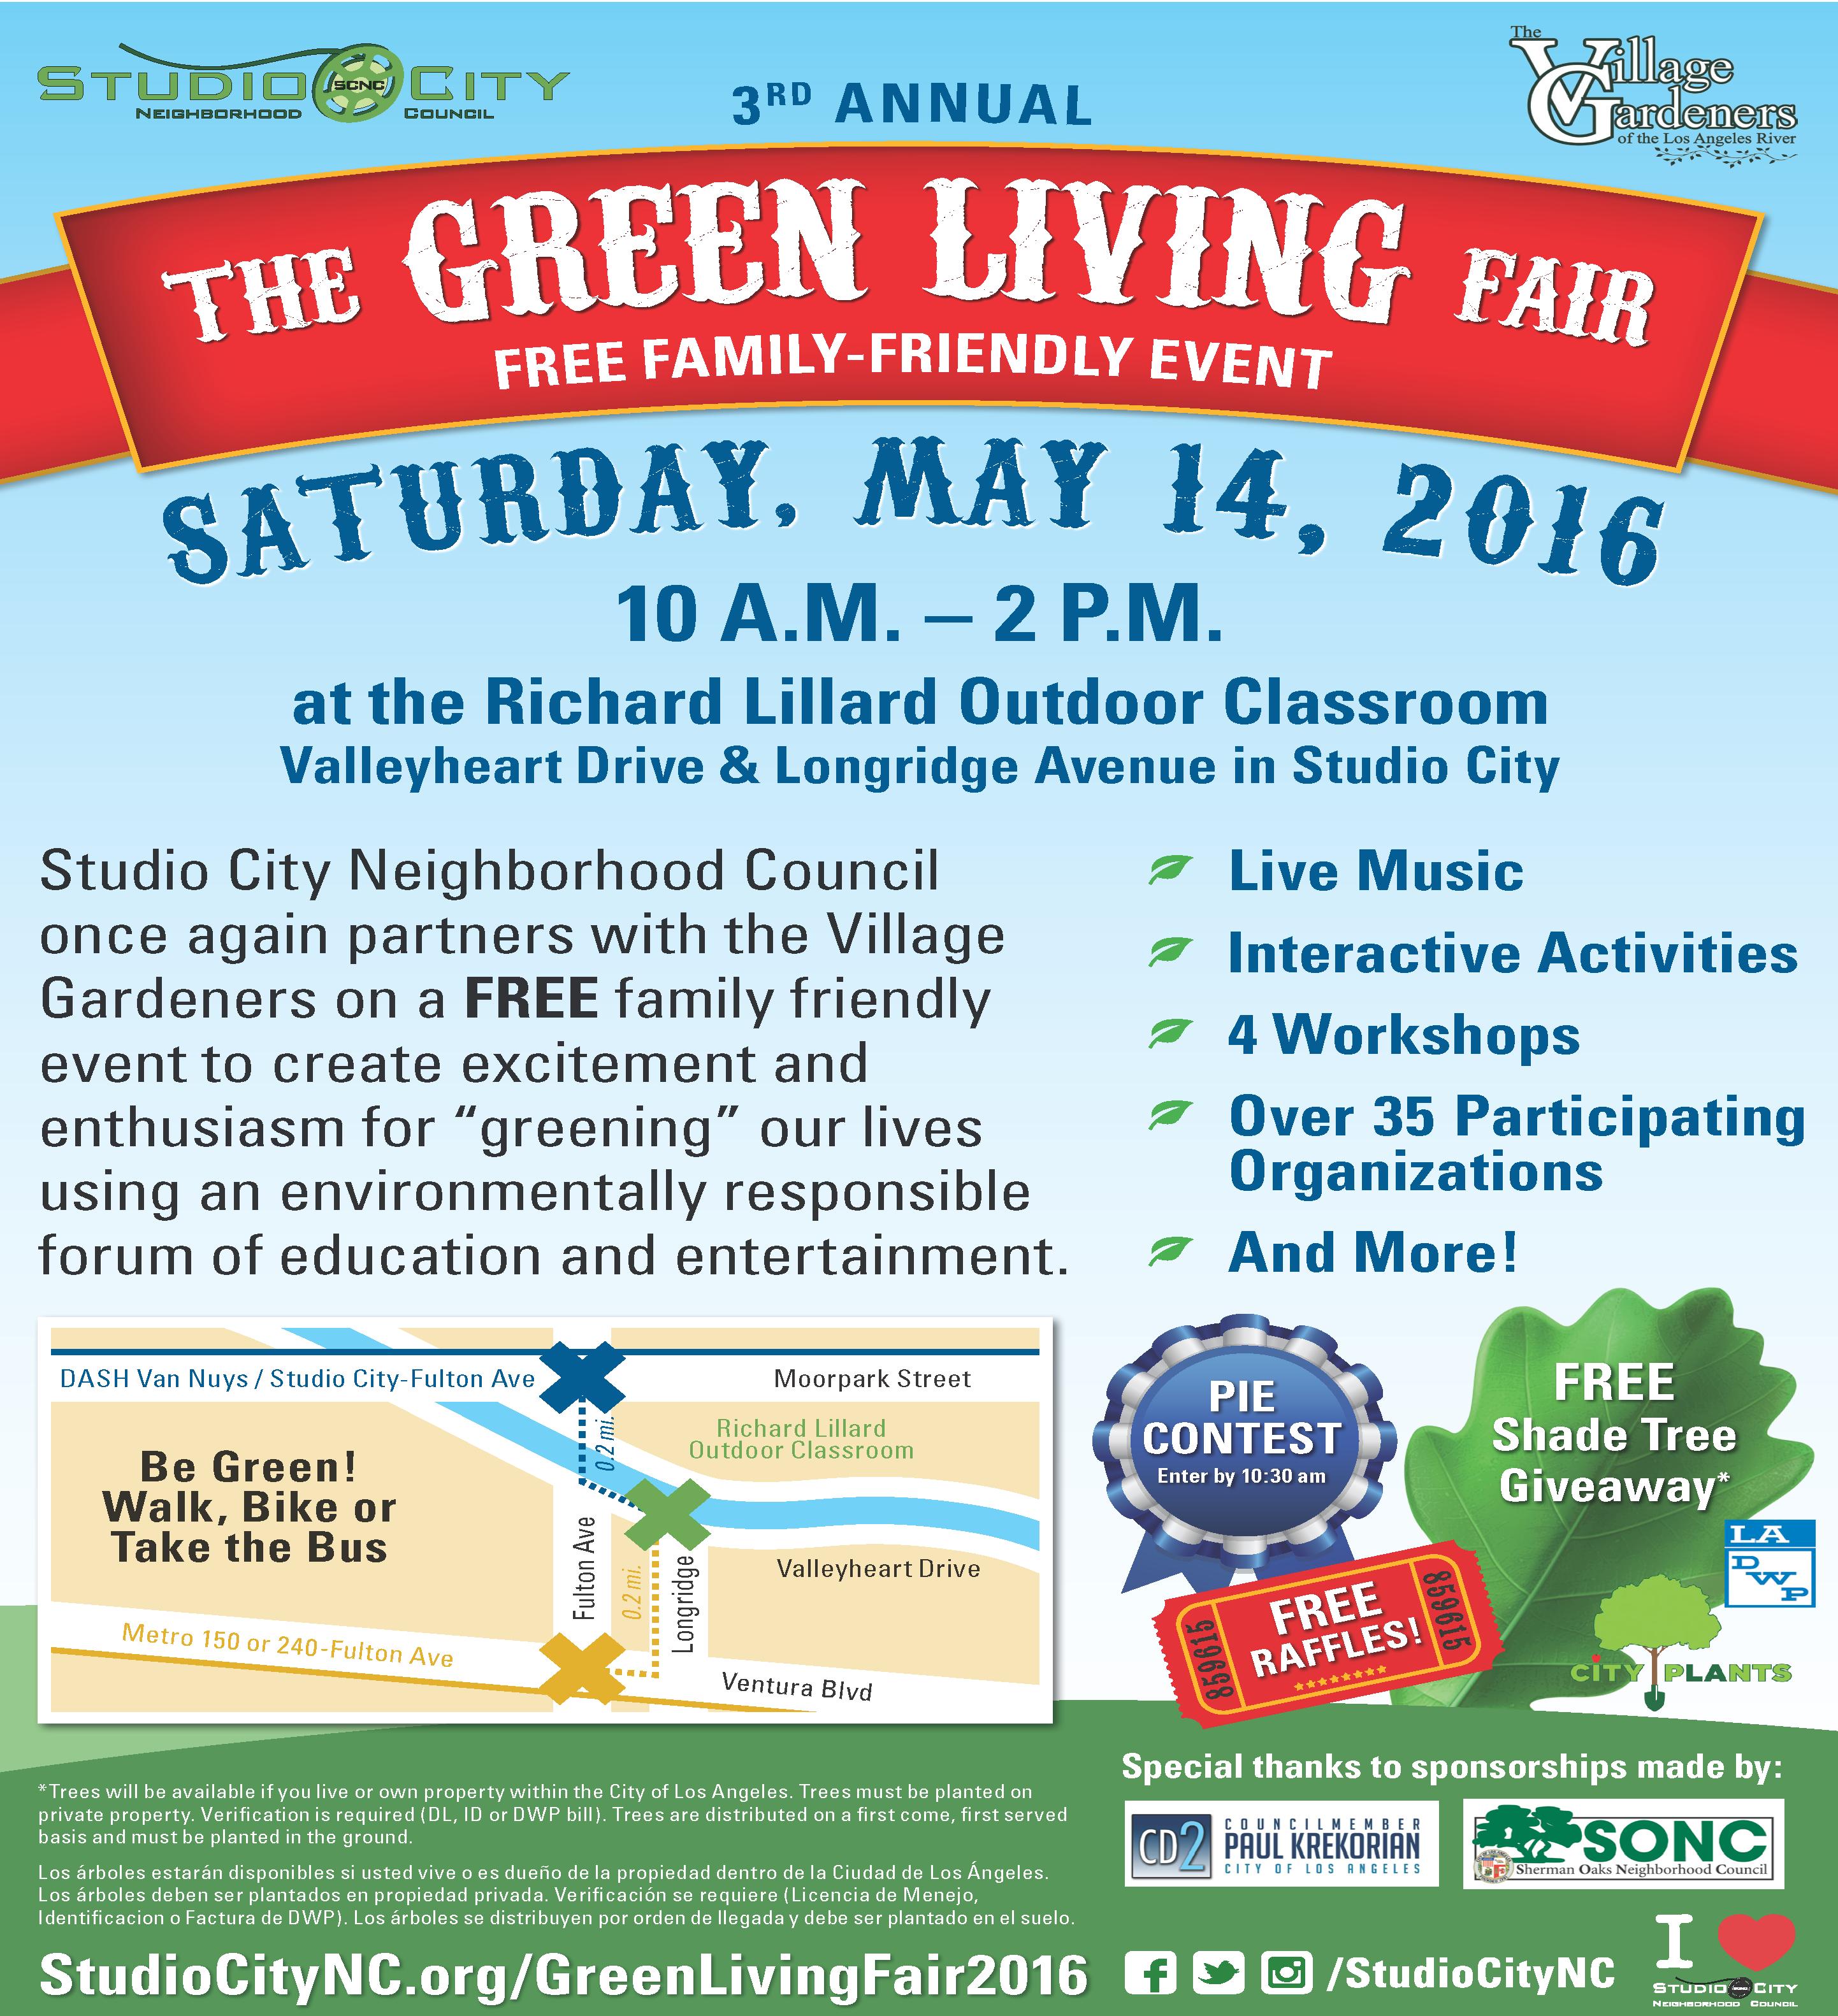 Studio City Green Living Fair - Los Angeles Community Garden Council